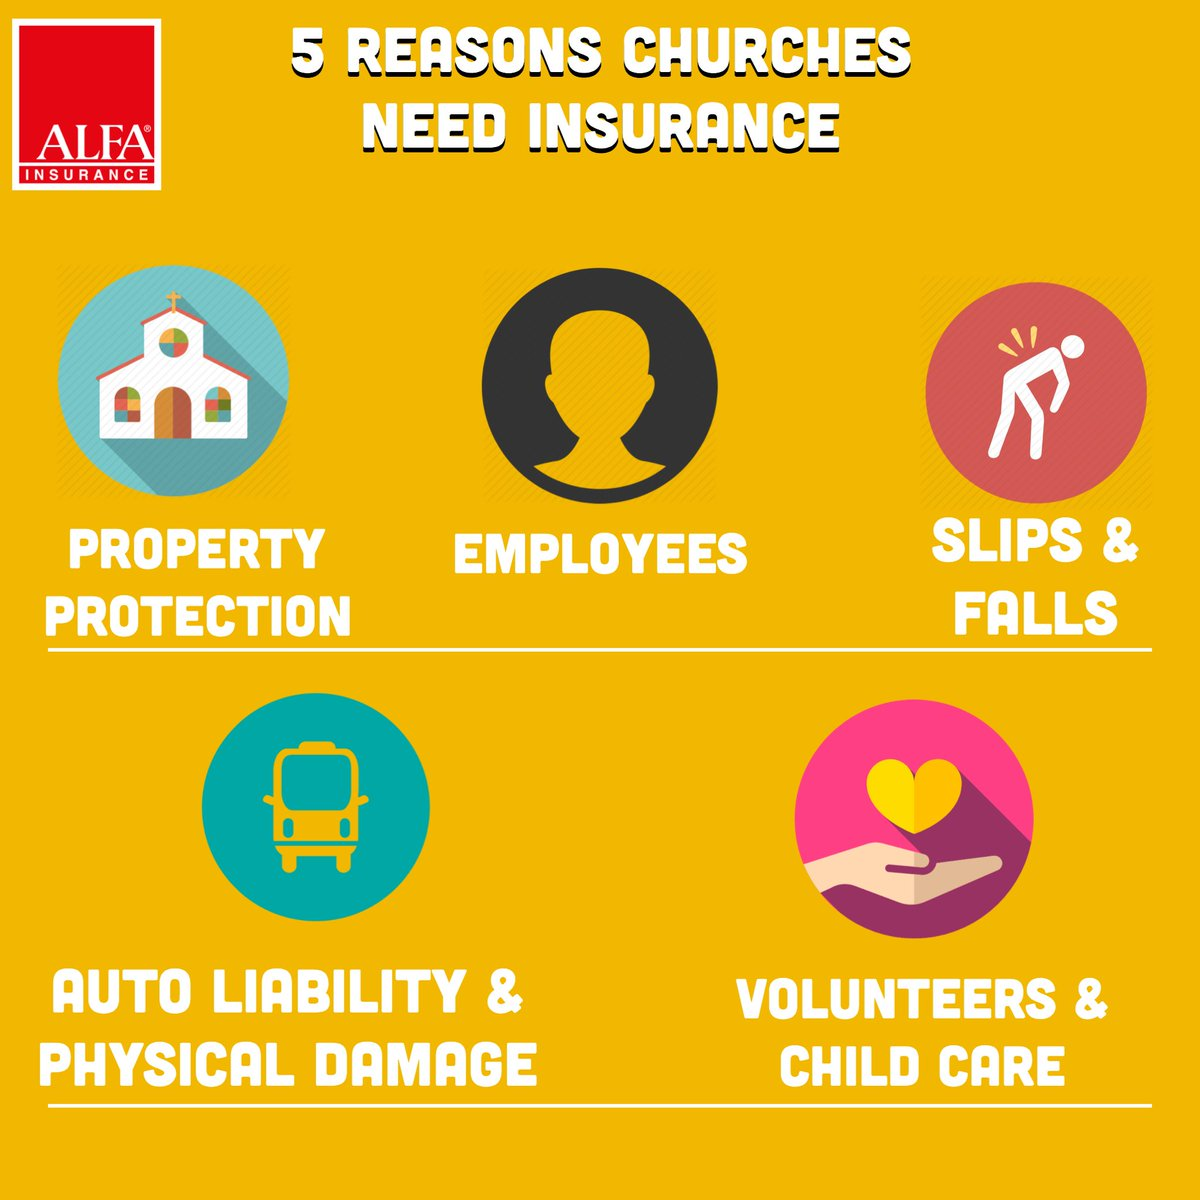 Alfa Auto Insurance >> Alfa Insurance On Twitter Insurance For Churches And